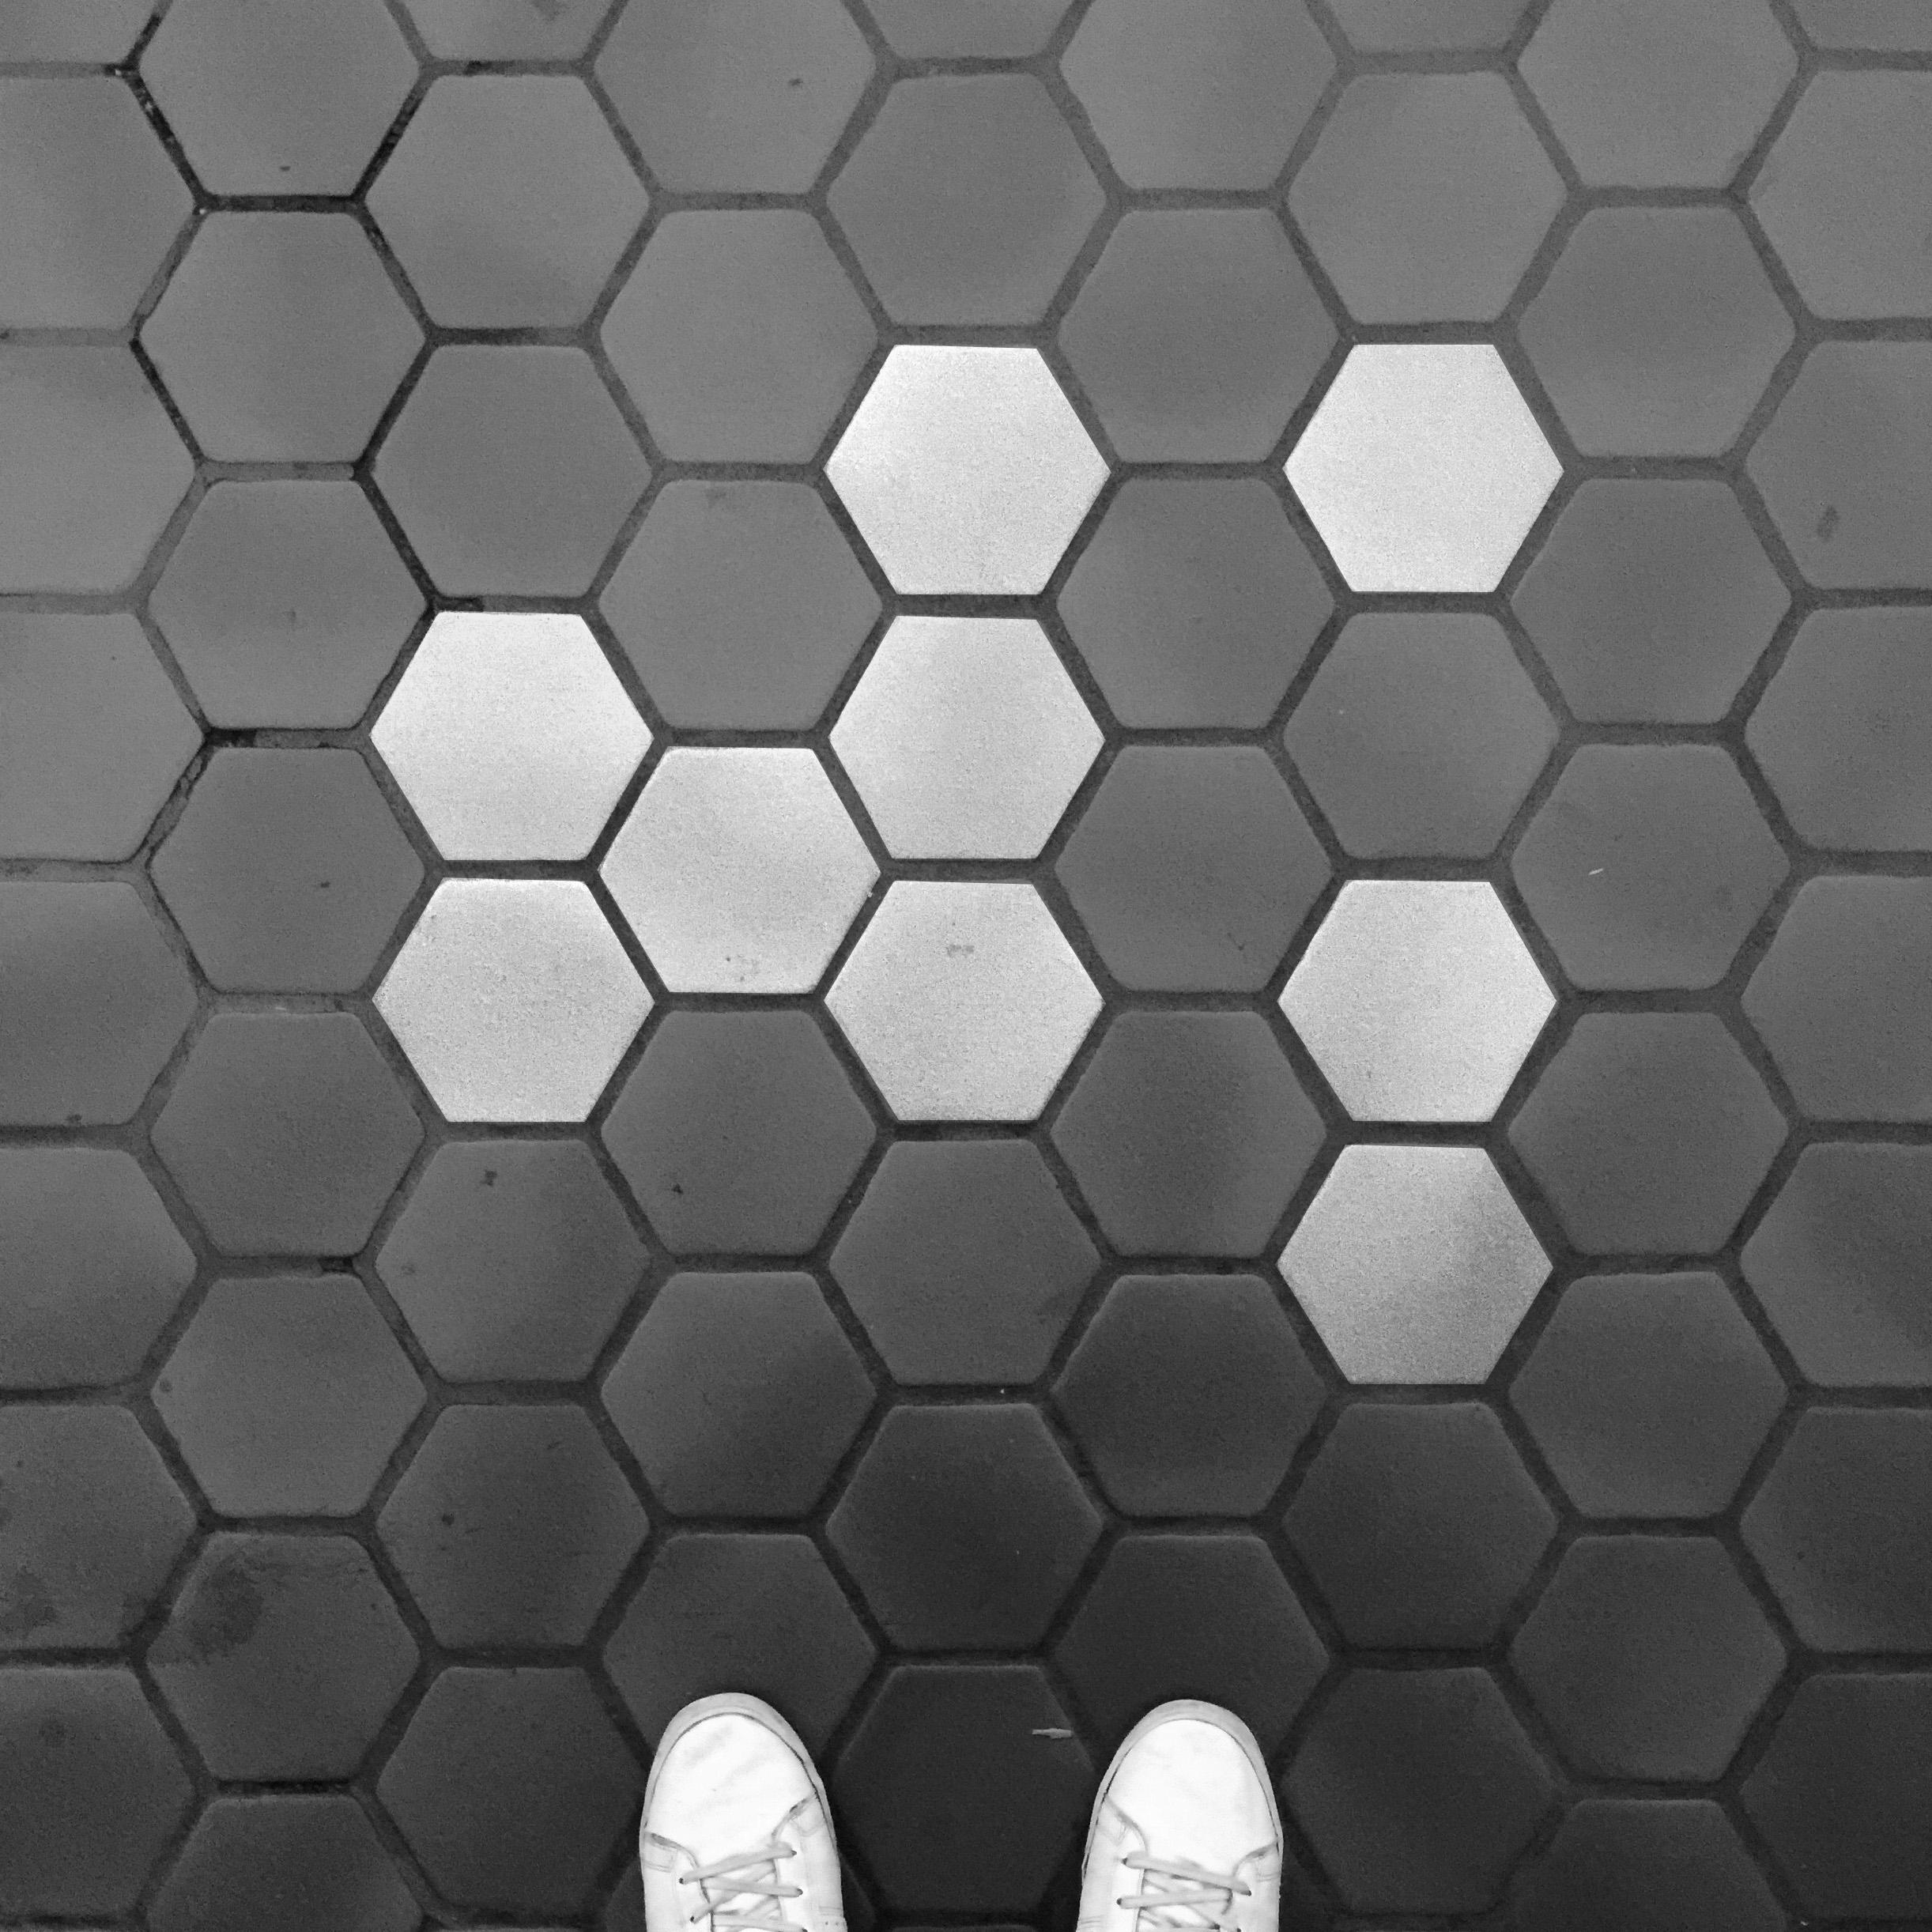 3 square Hi-Metro-Tiles-4-3-17.jpg